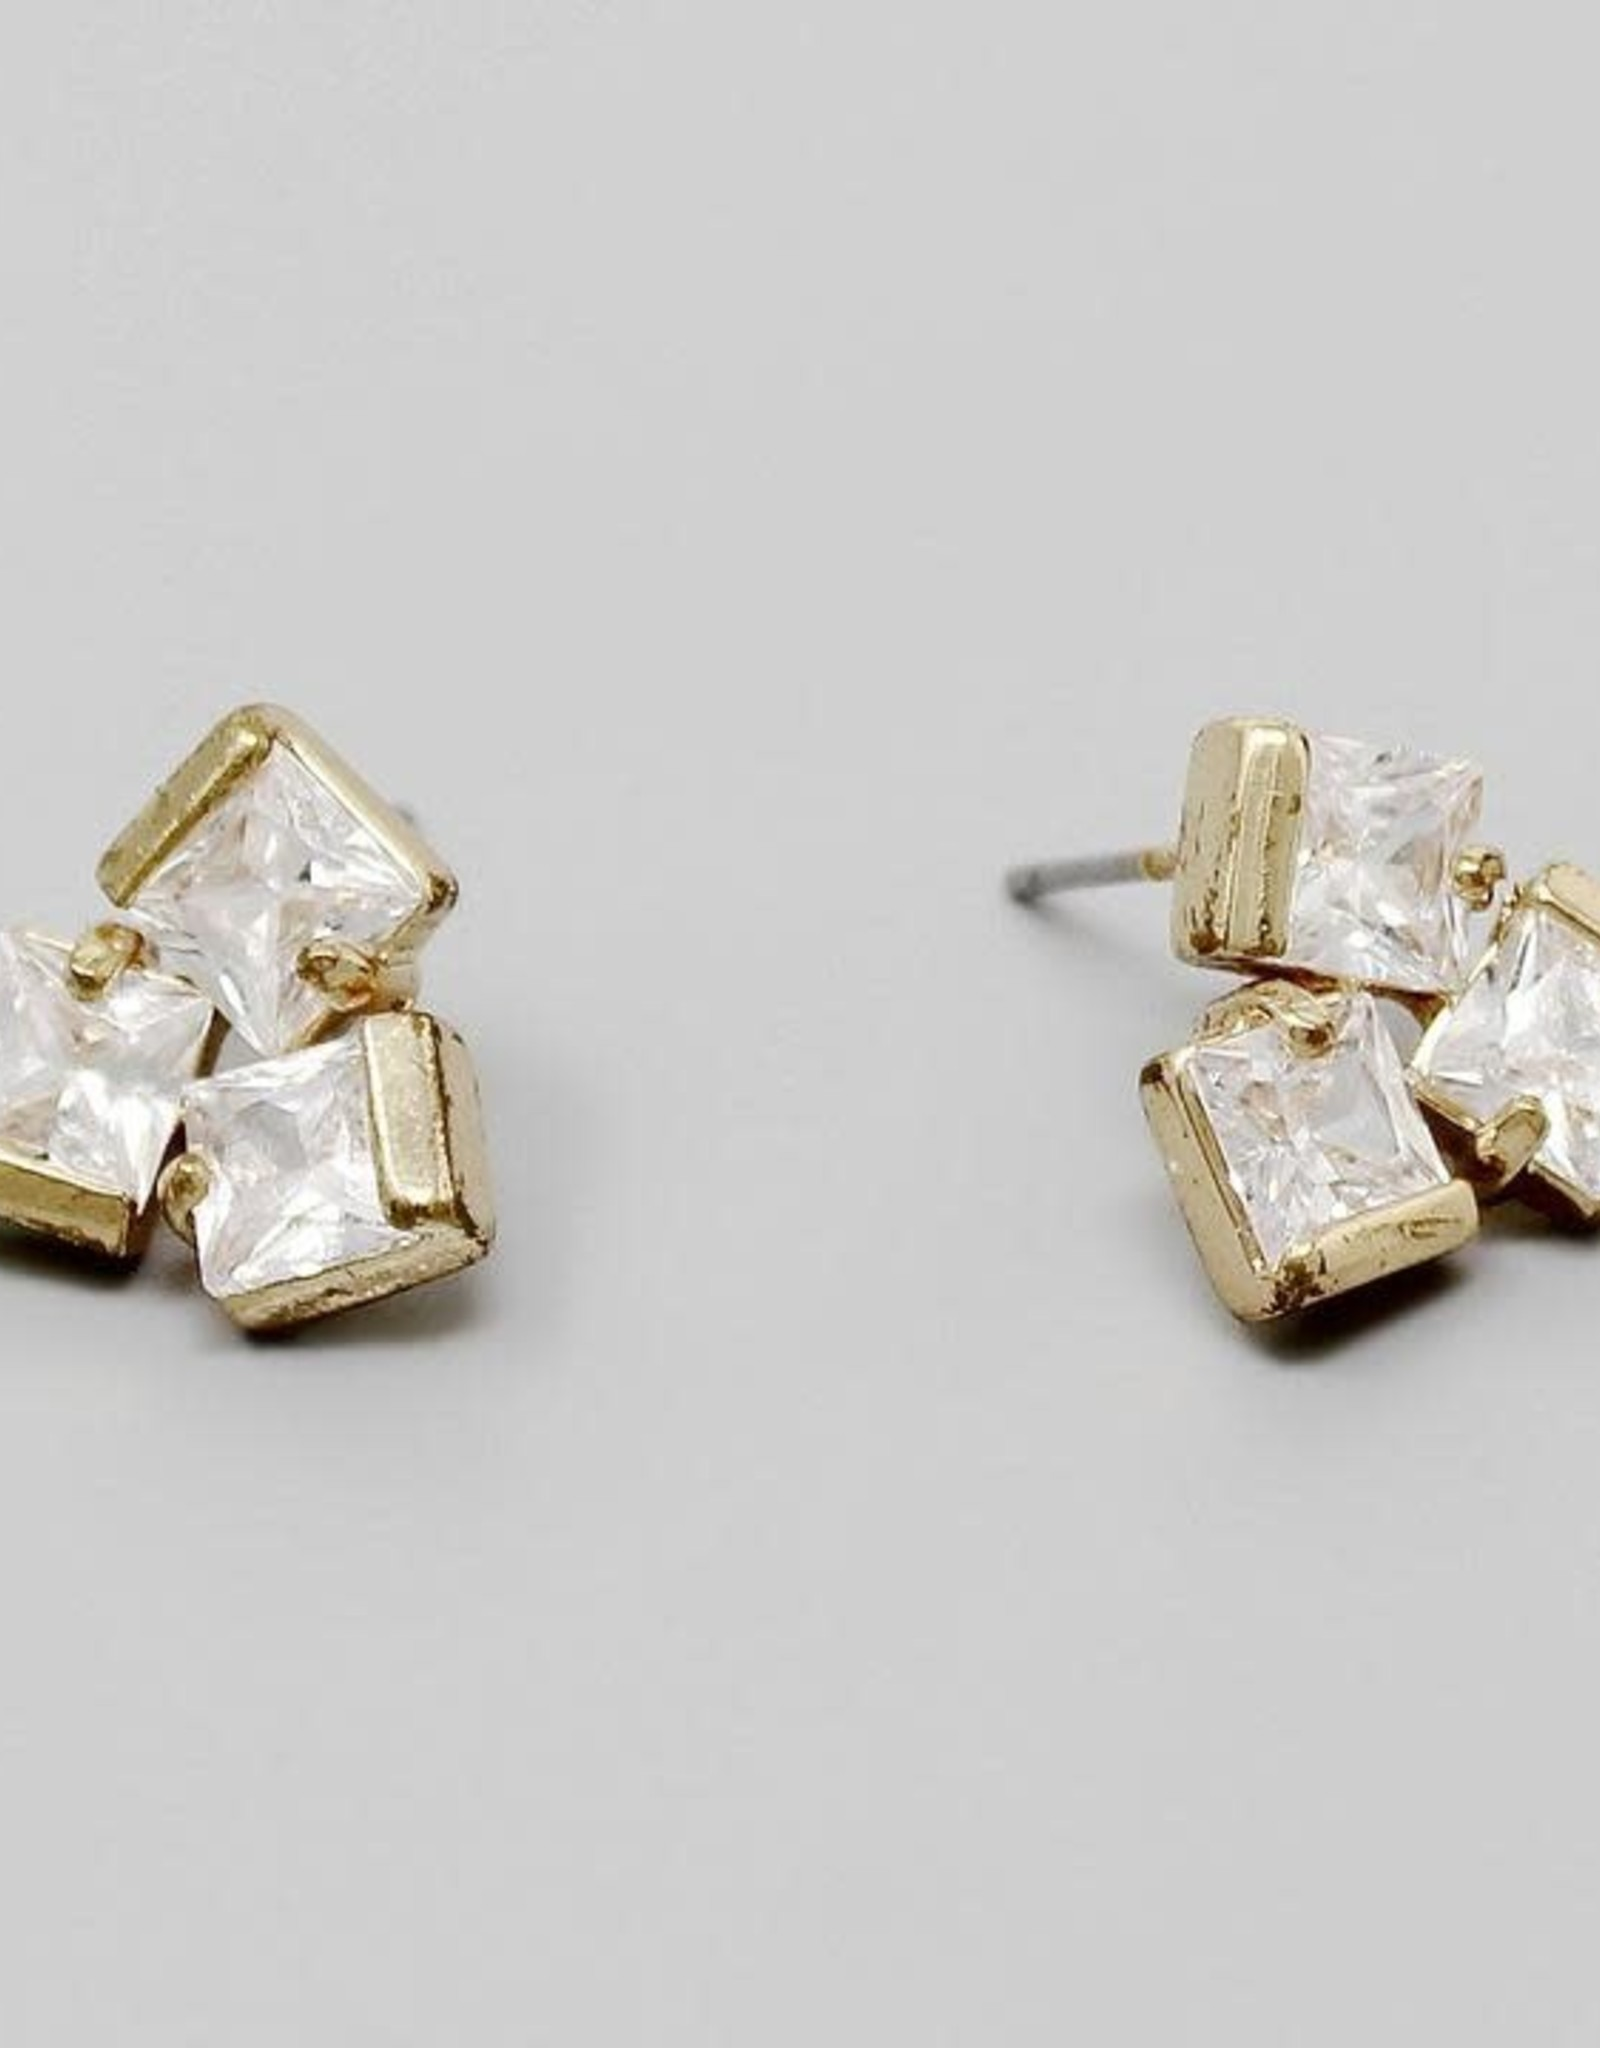 CZ Stone Cluster Stud Earrings - Gold